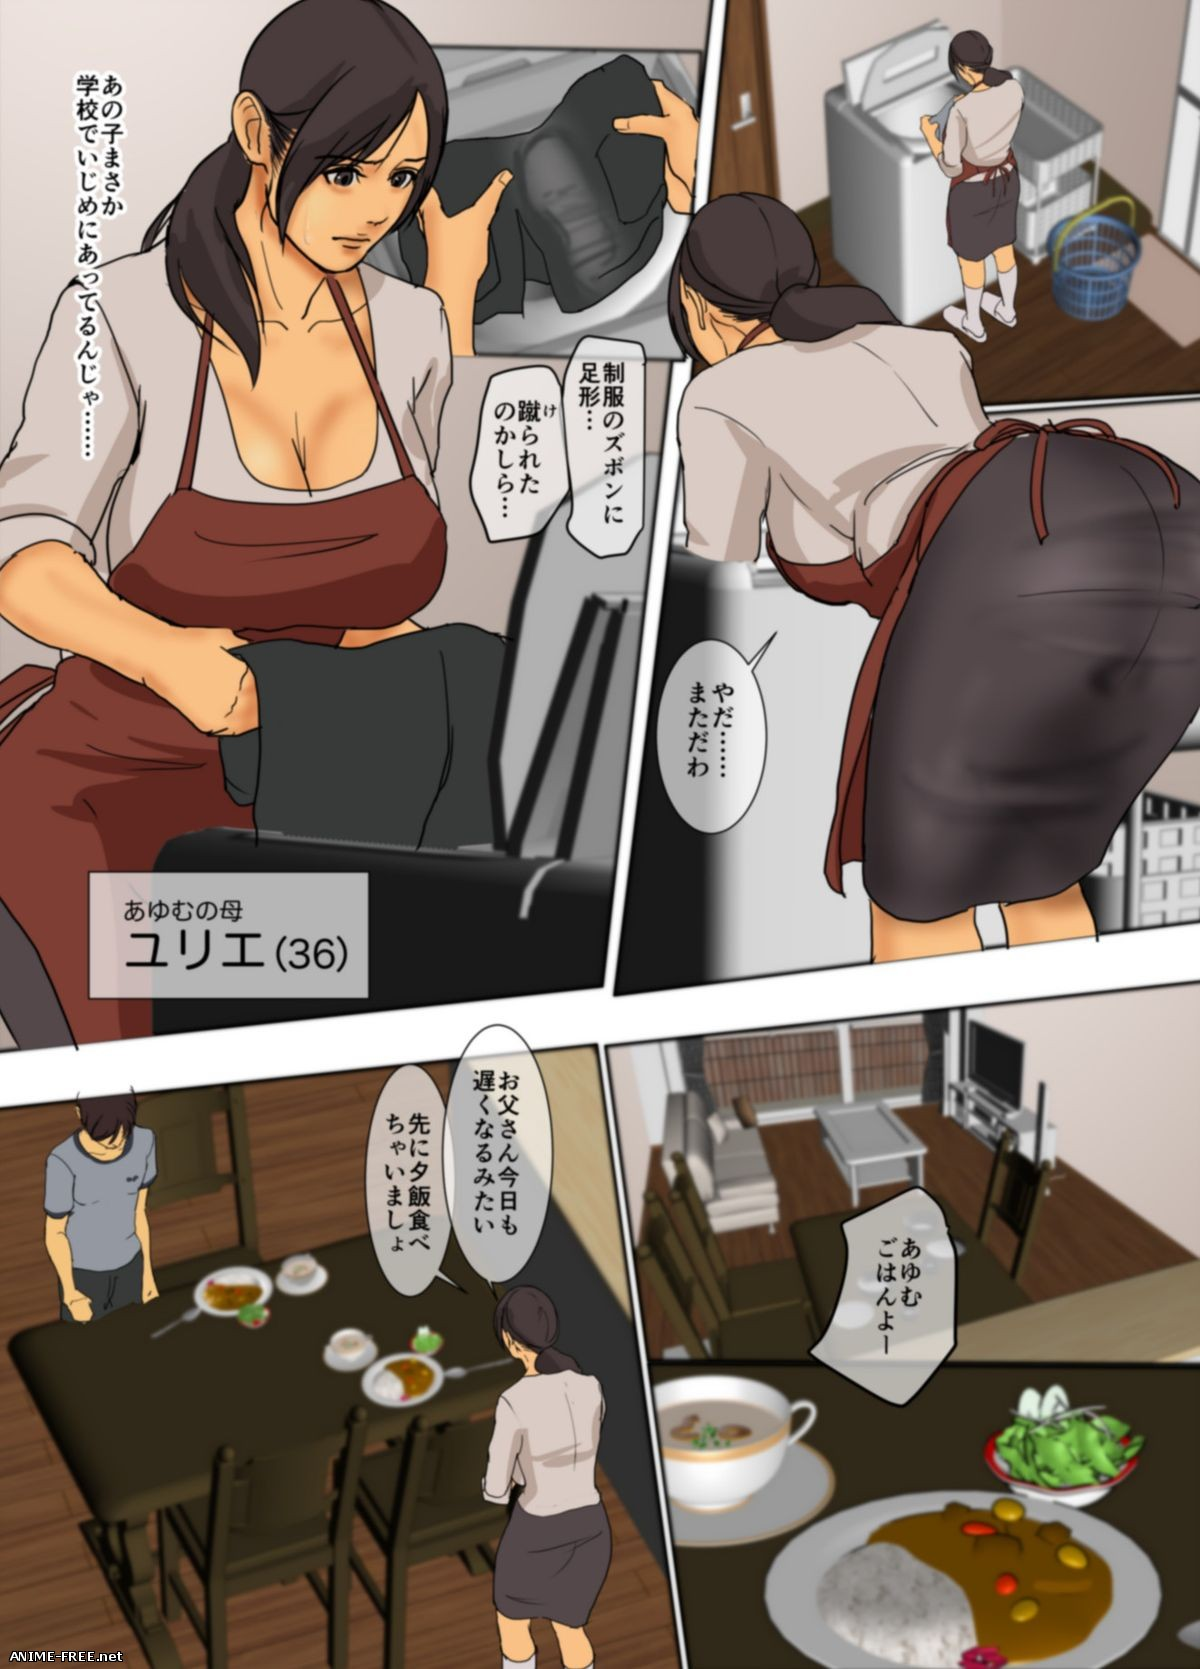 [Yojouhan Shobou] — Ikenie no Haha / Sacrificial Mother [Cen] [JAP,ENG] Manga Hentai